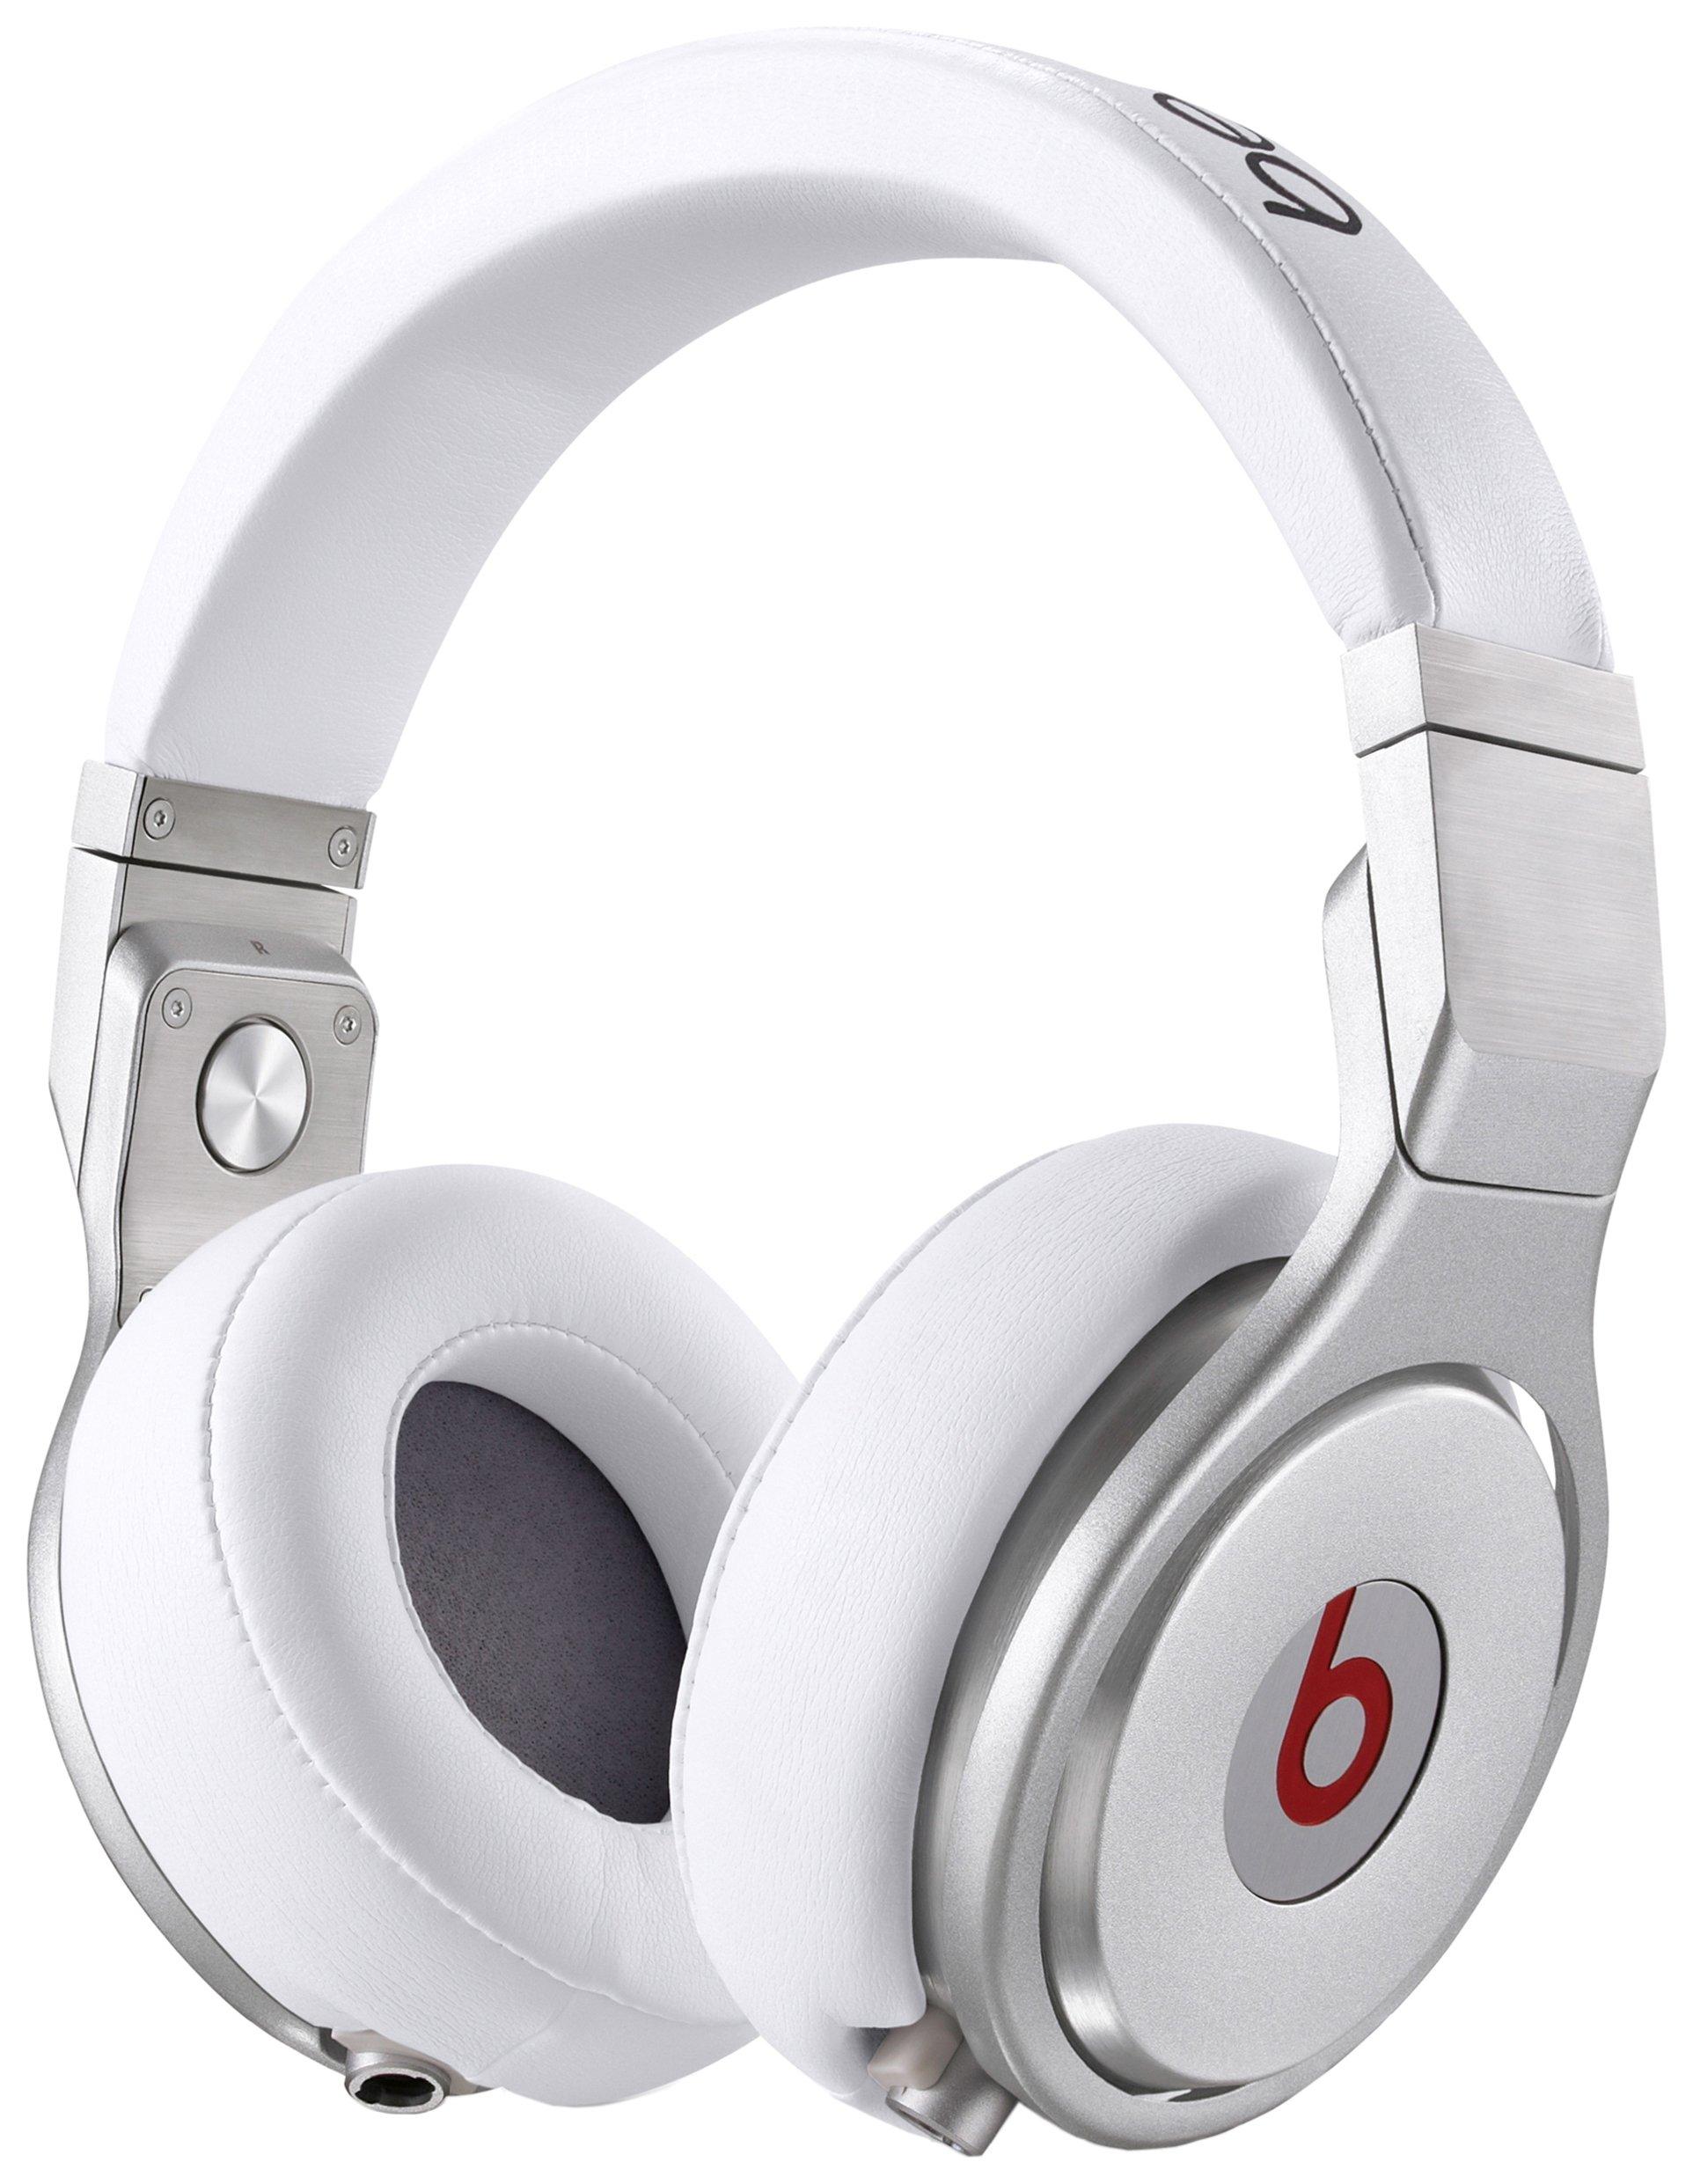 Image of Beats Pro Over - Ear Headphones - White